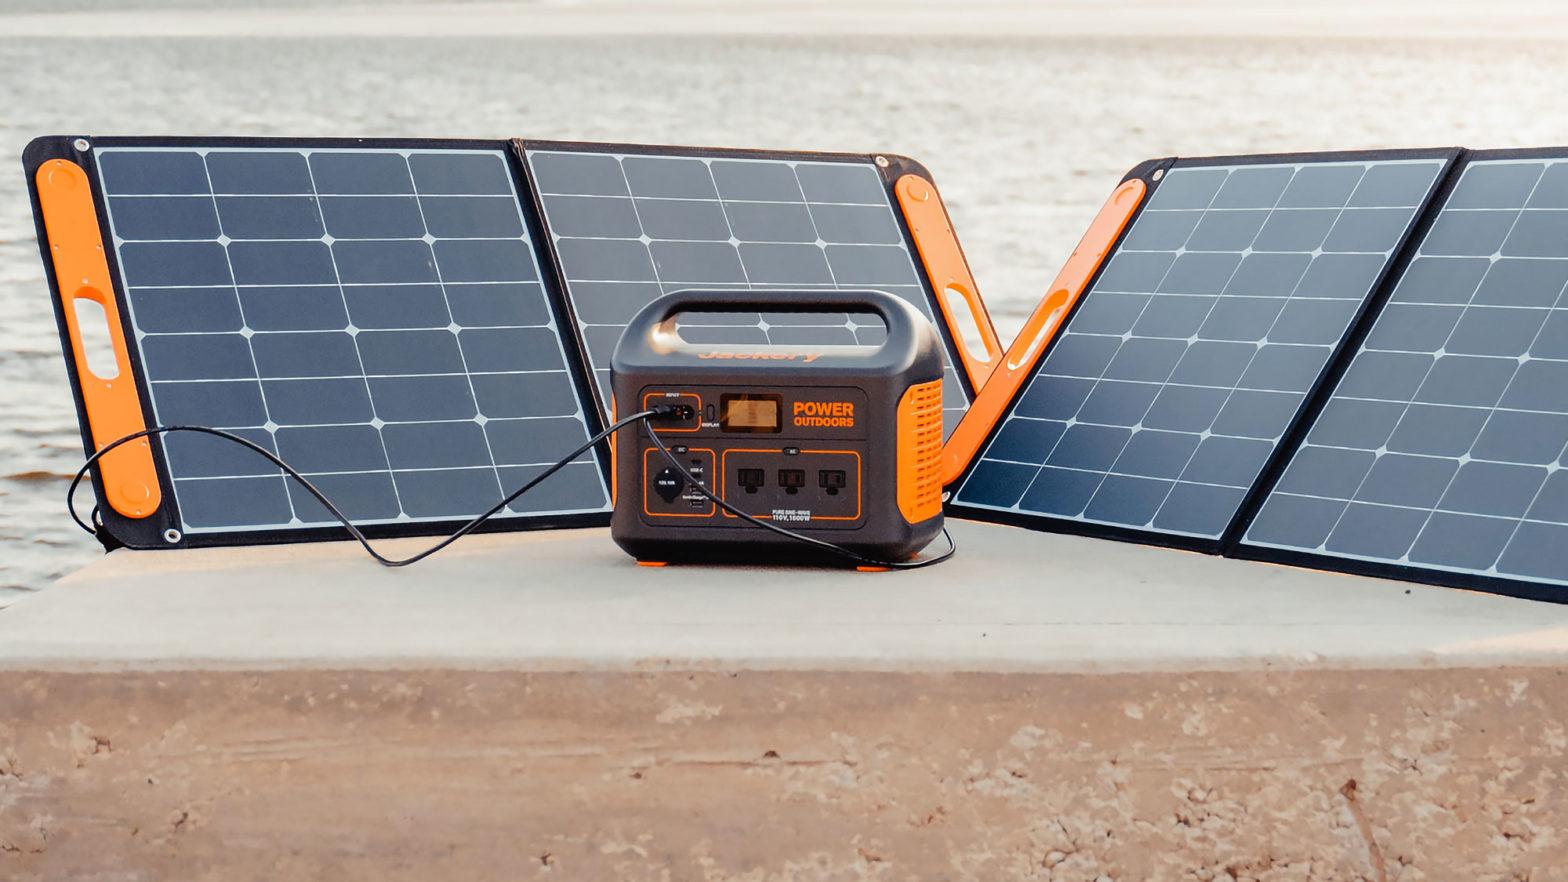 Jackery Explore 1000 Portable Power Station